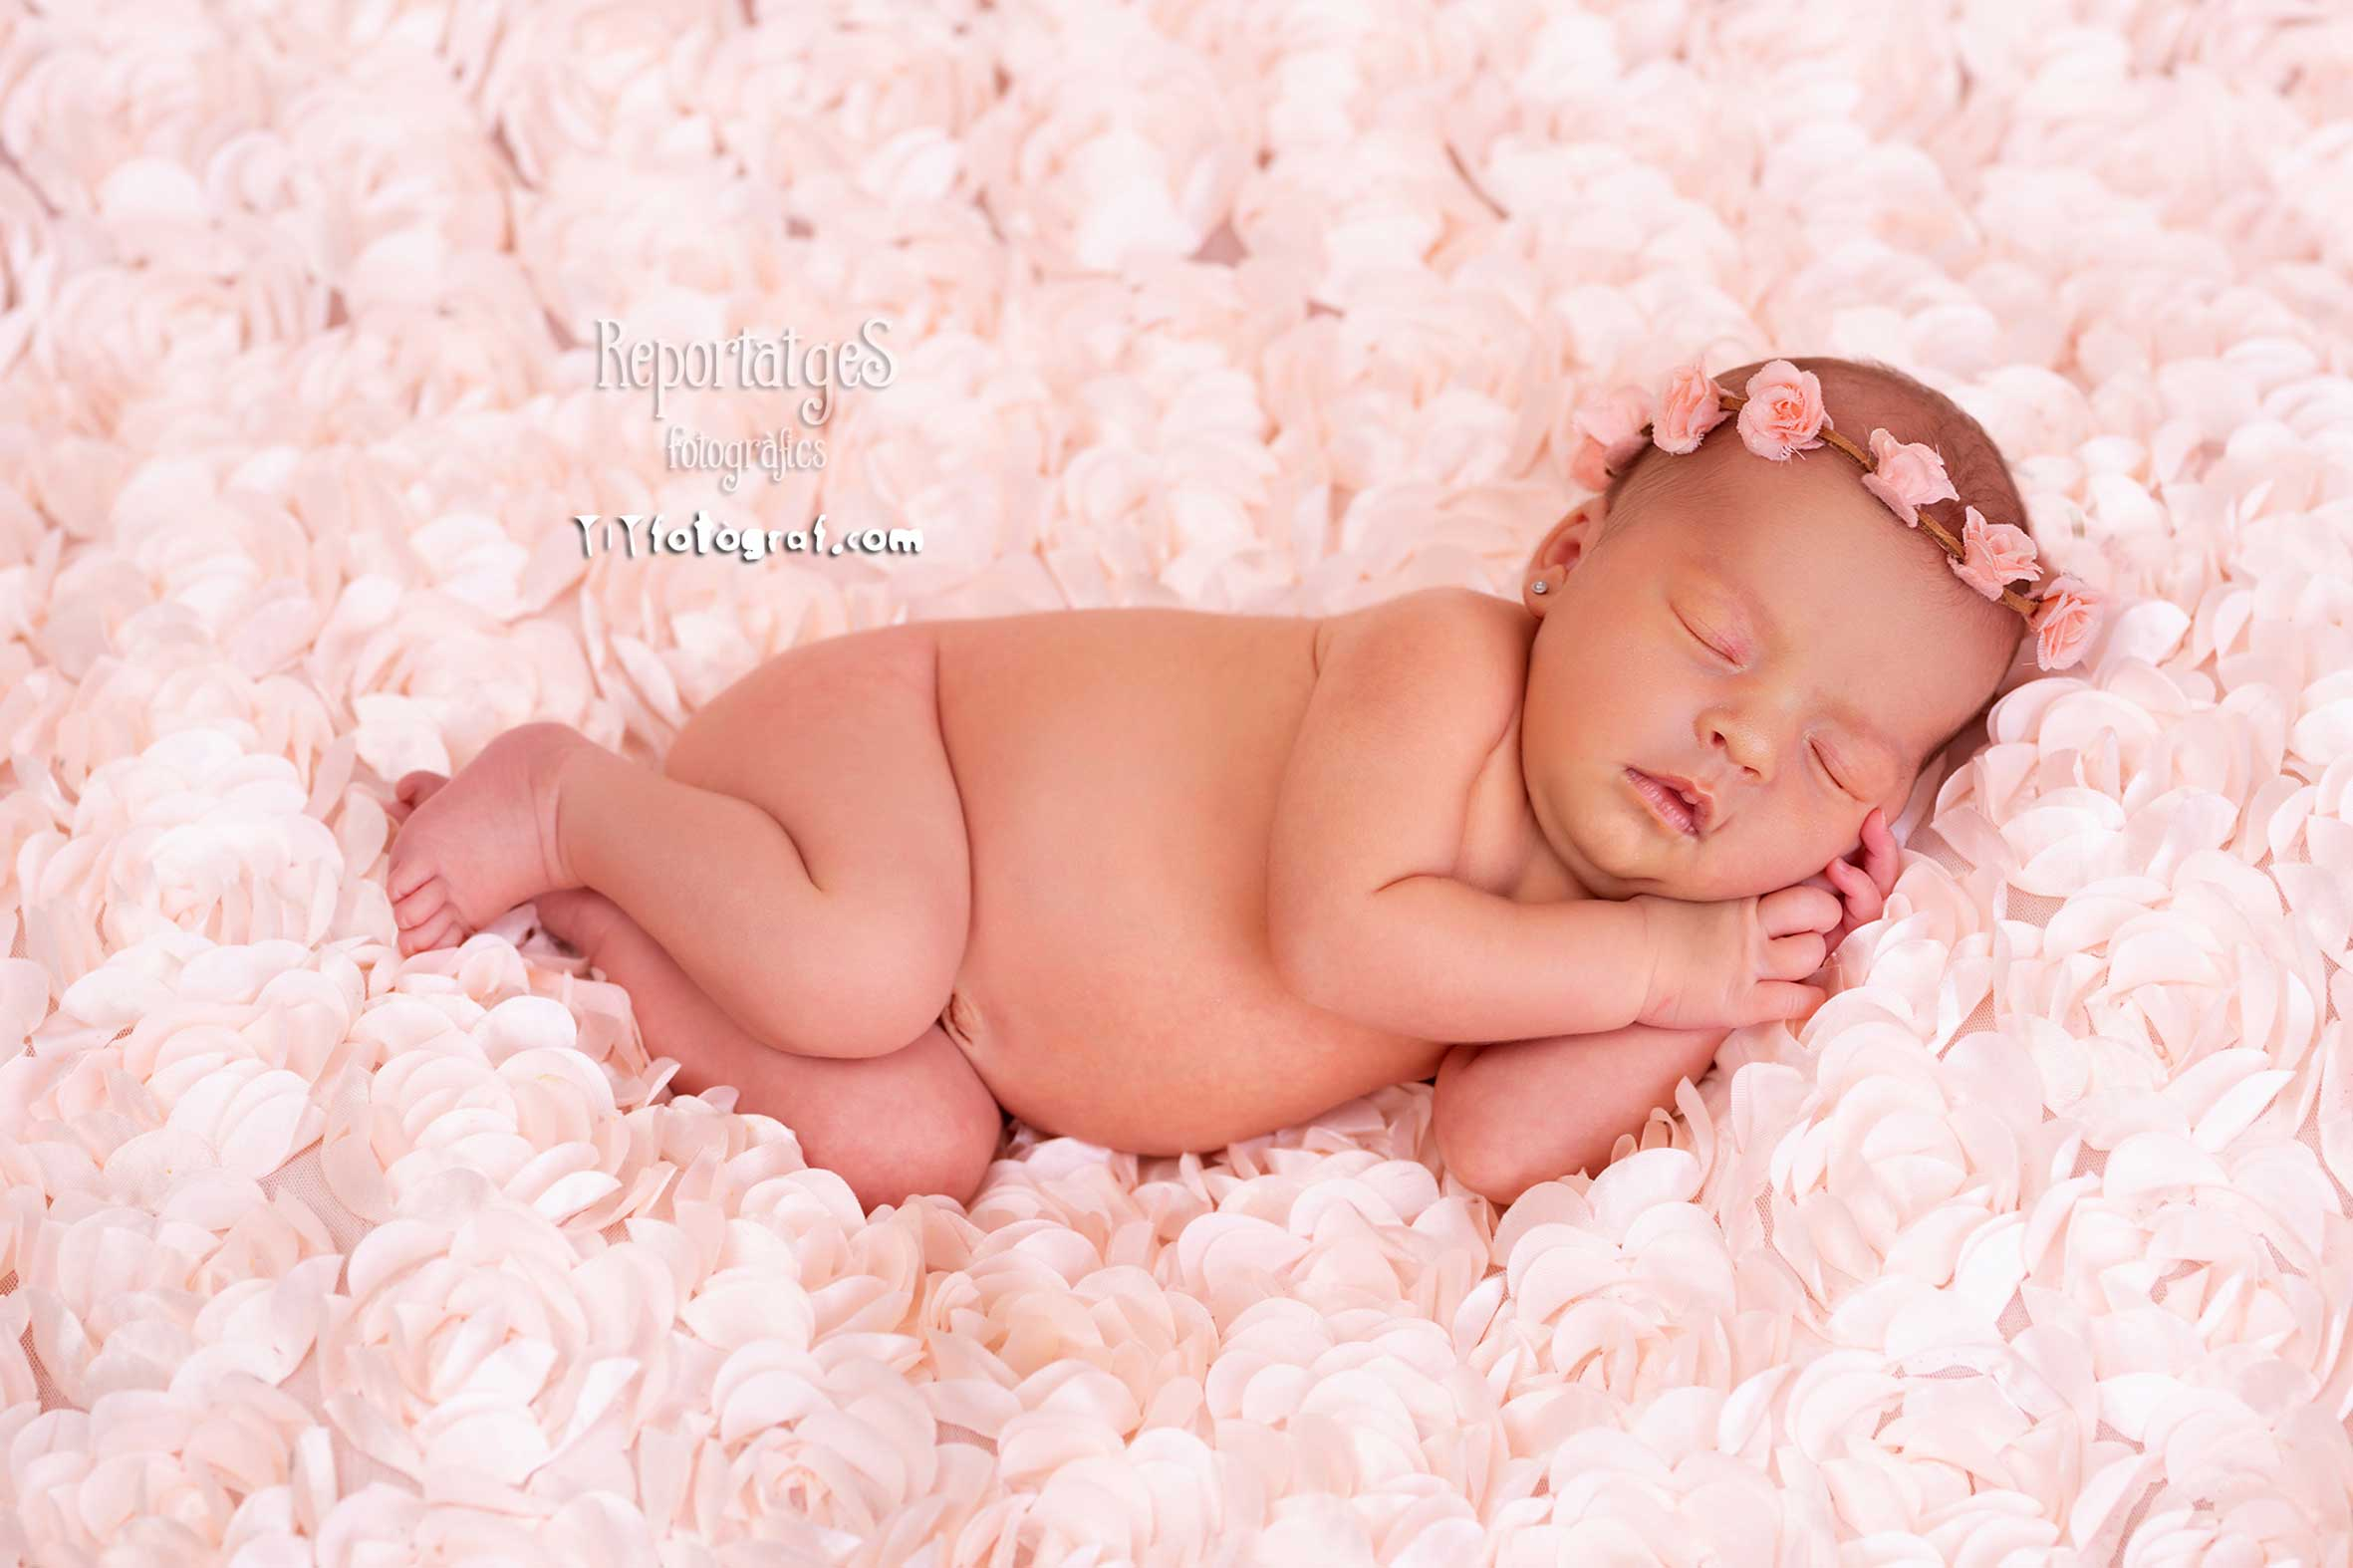 nadons newborn